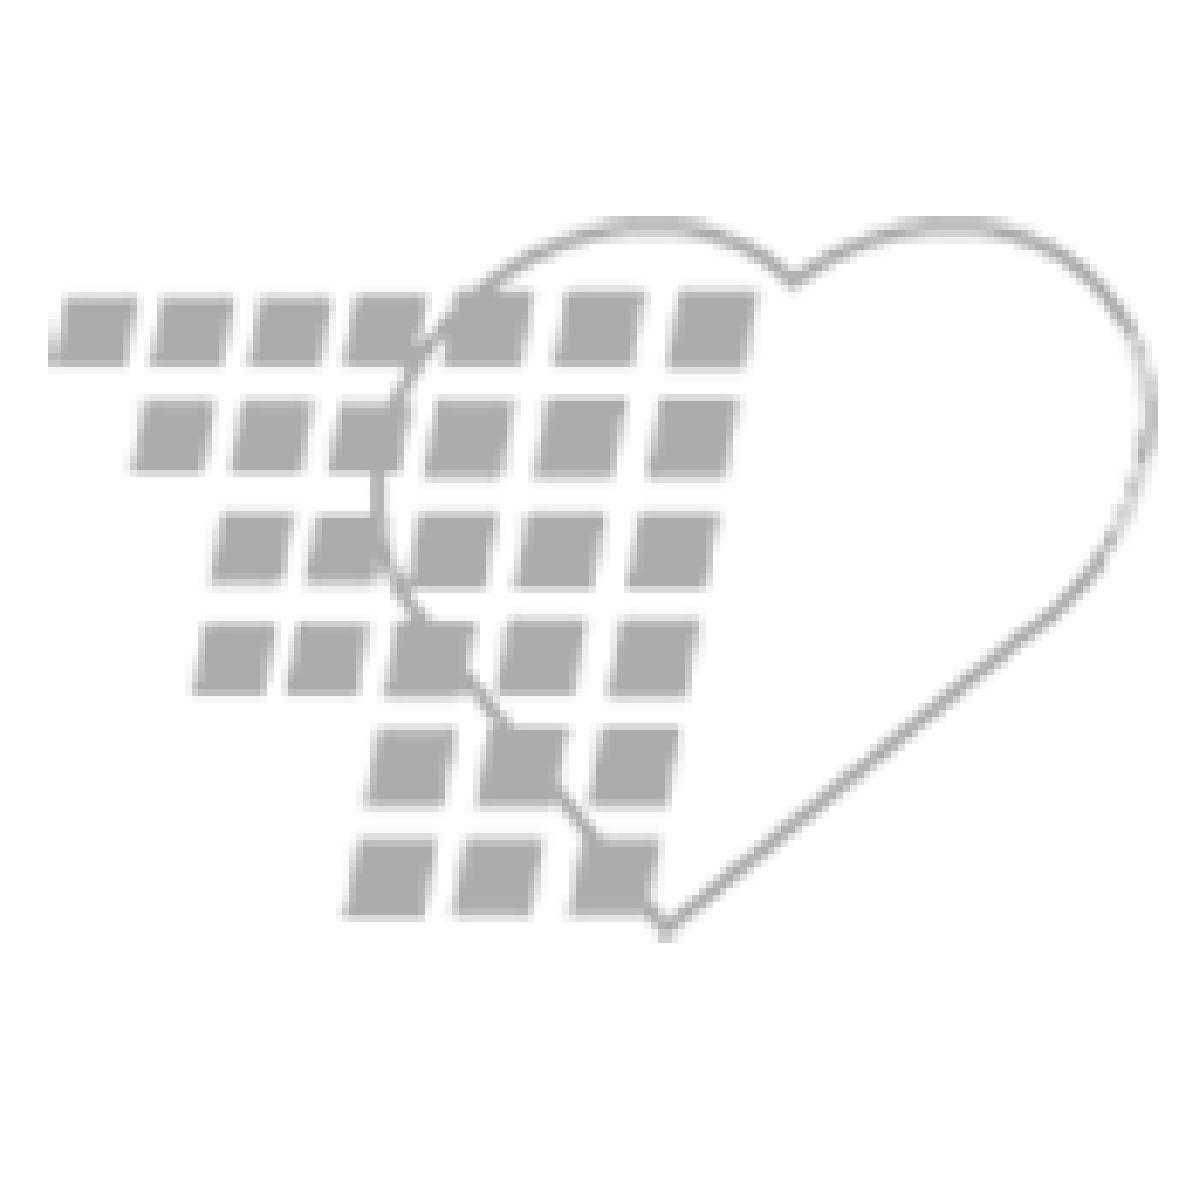 08-02-31 - BD   E-Z Scrub   Preoperative Surgical Scrub Brush 205 with Povidone Iodine